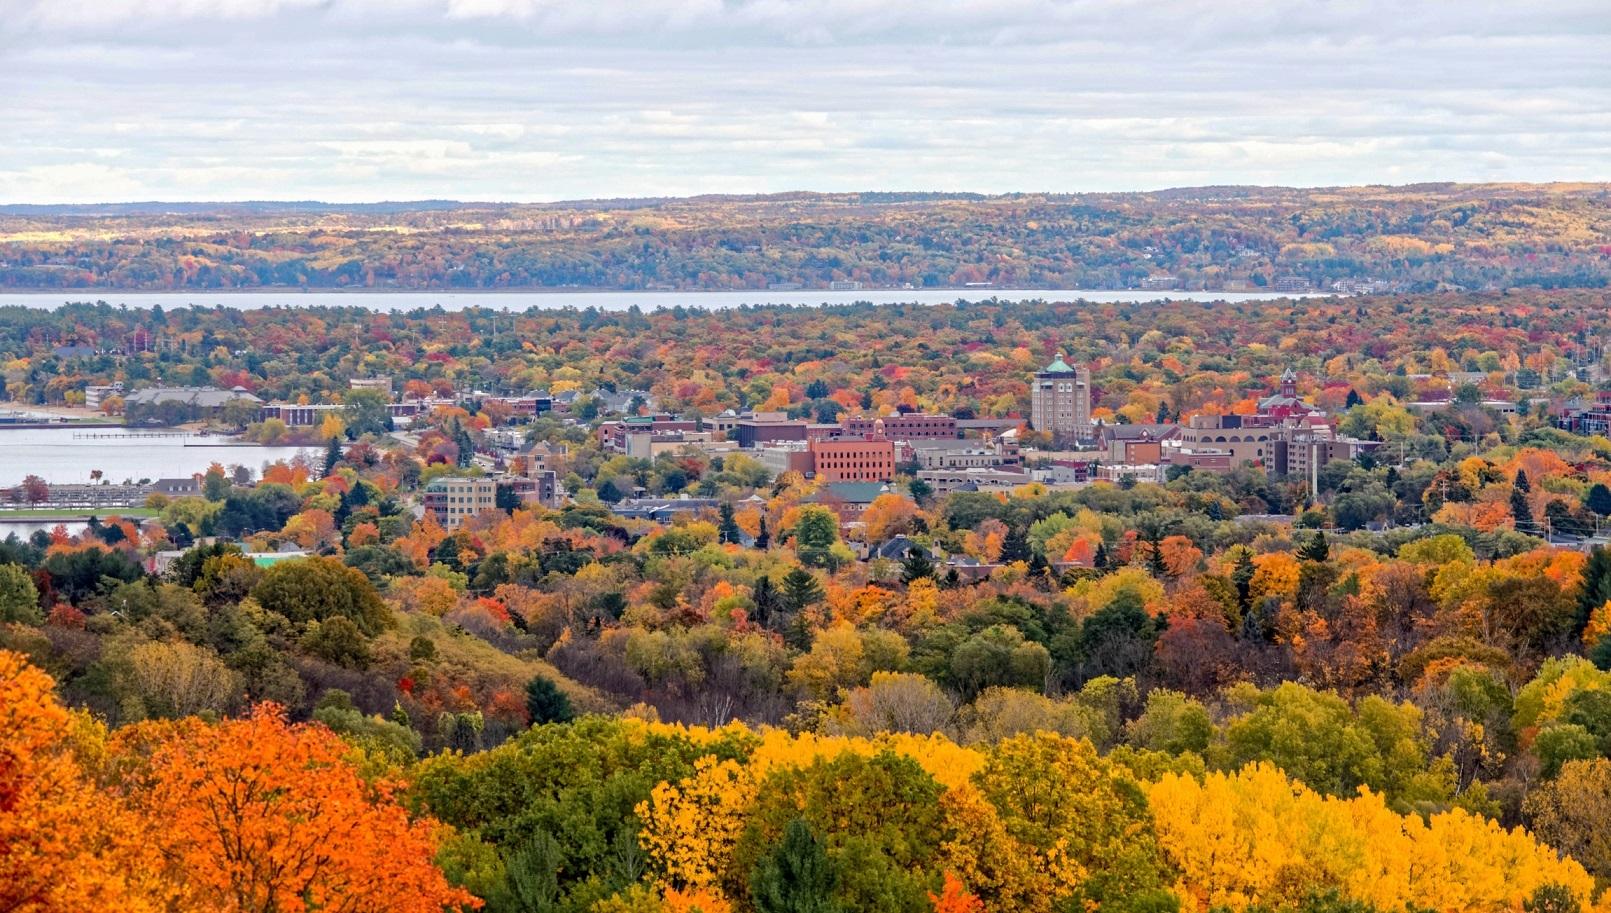 Autumn in Traverse City, Michigan